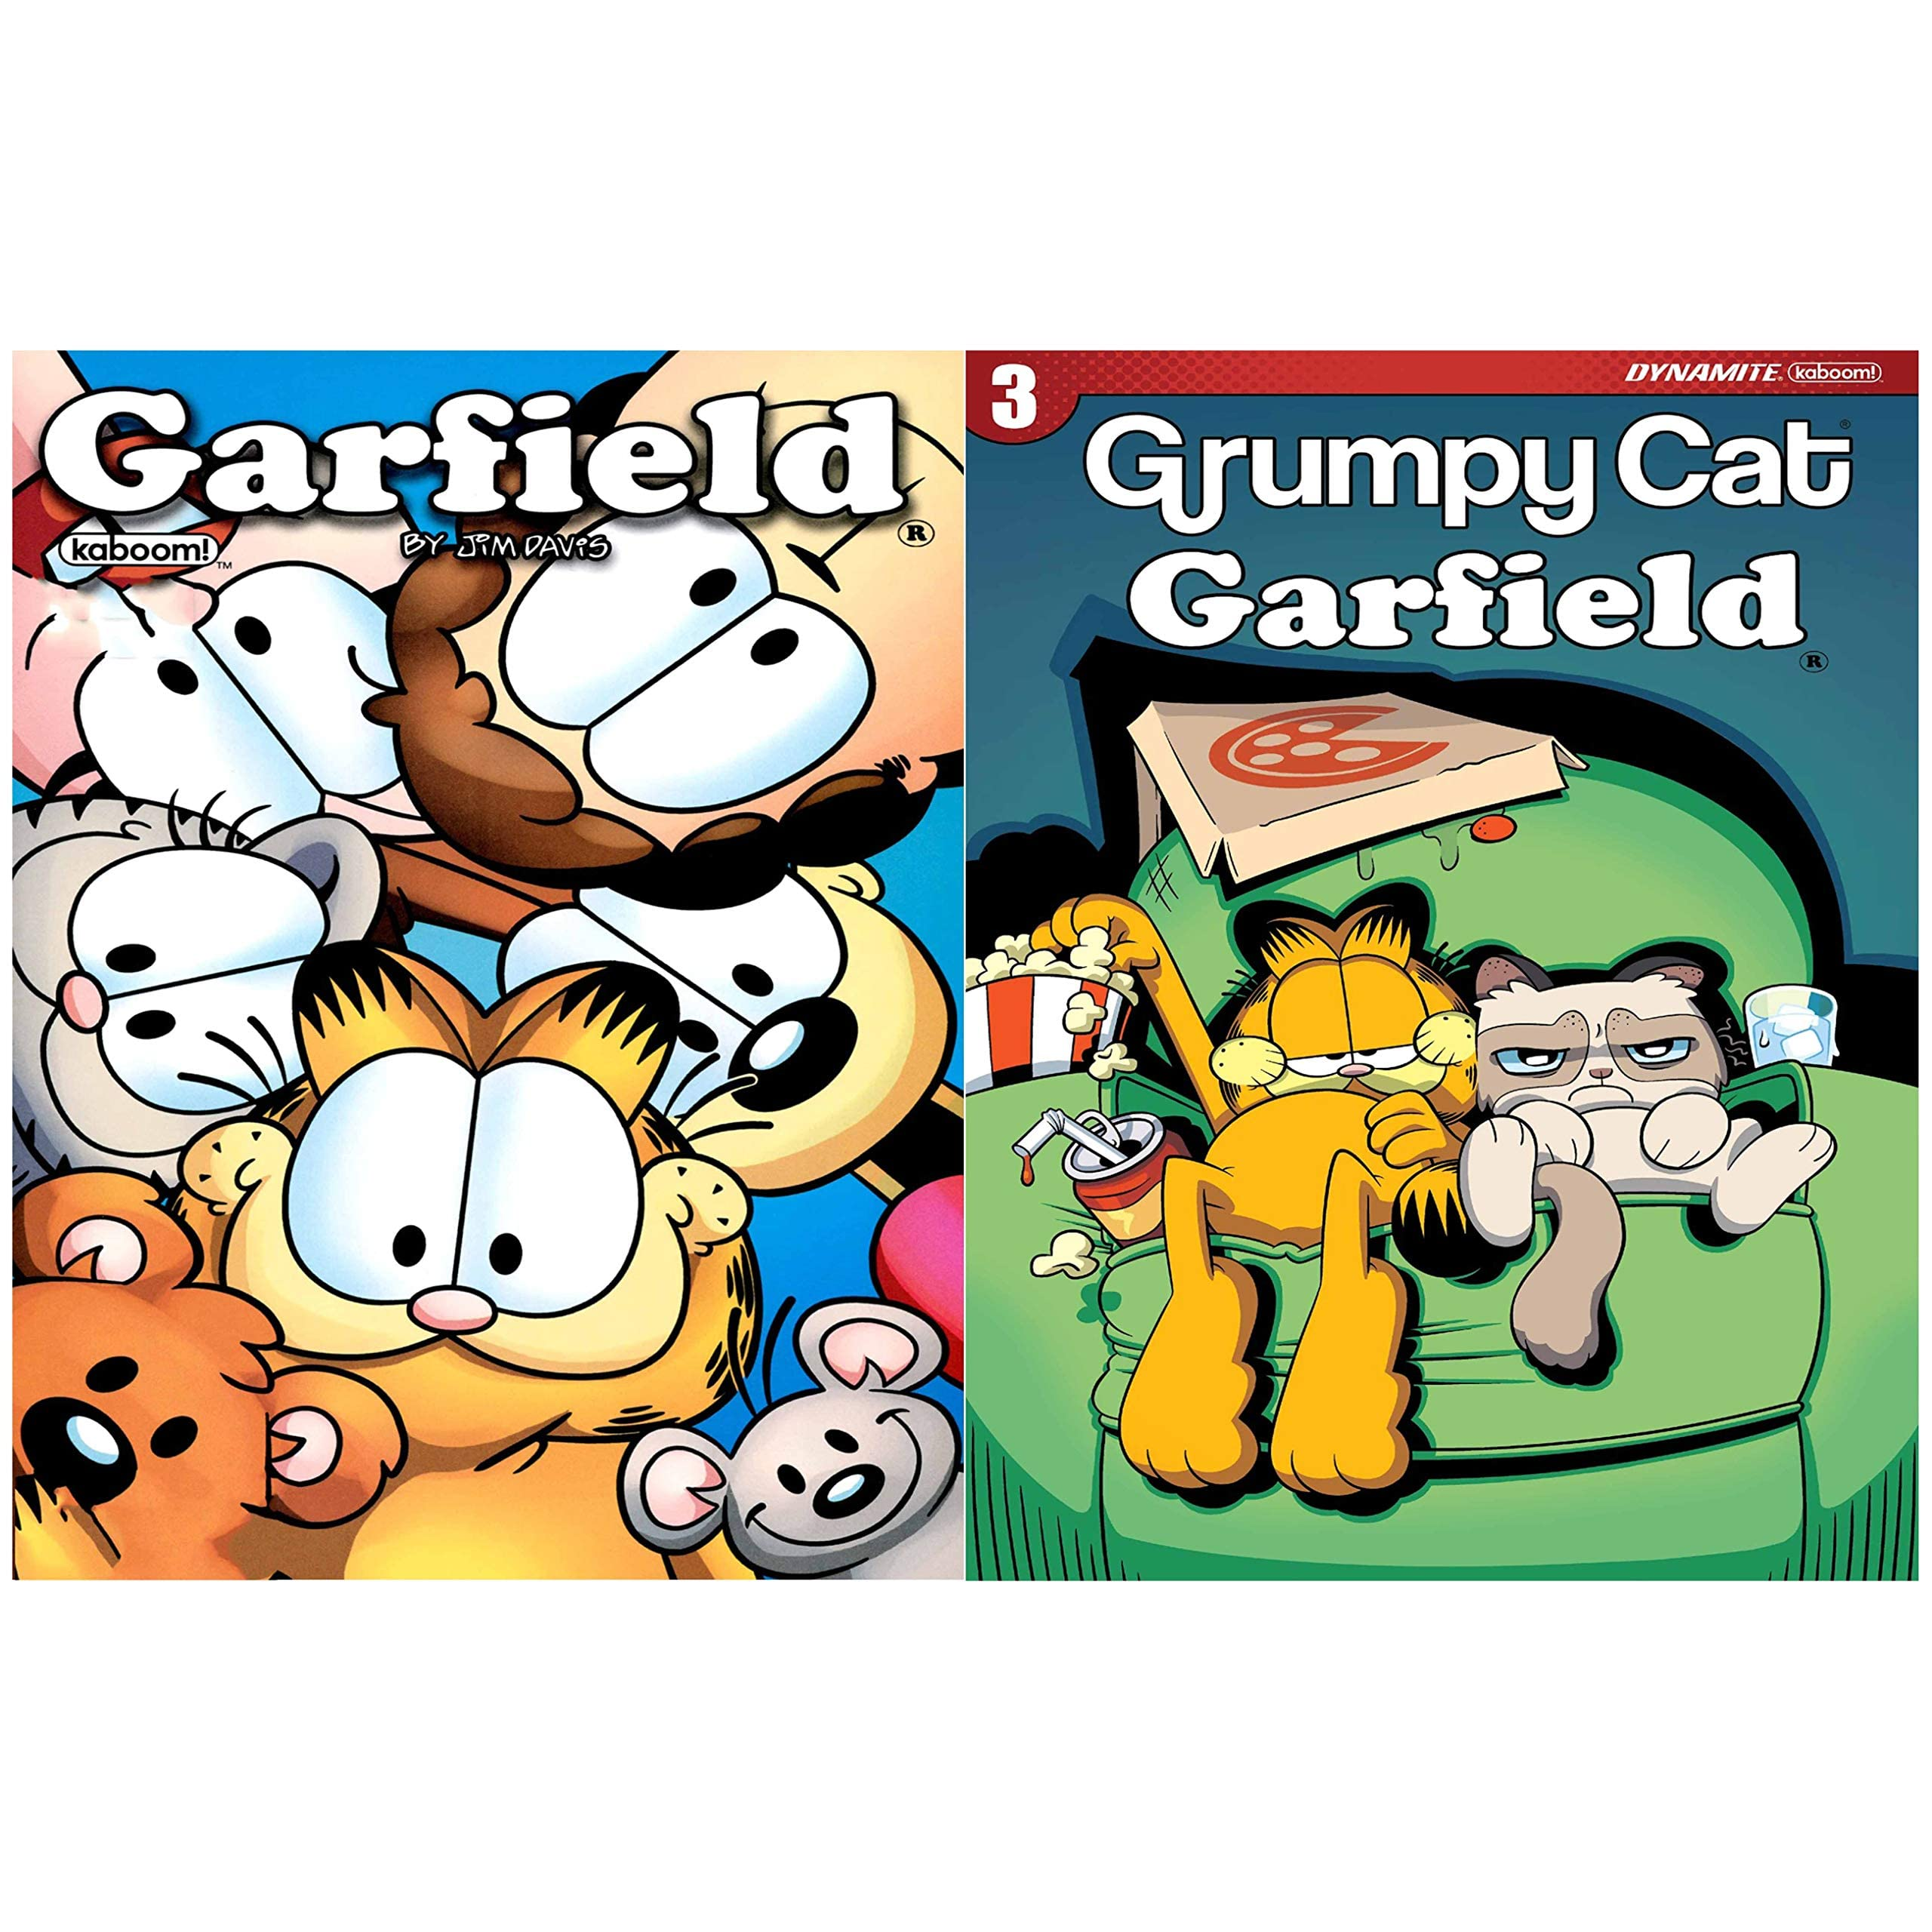 Garfield Full Series Grumpy Cat Garfield Issue 3 By Alexandre Bernassau